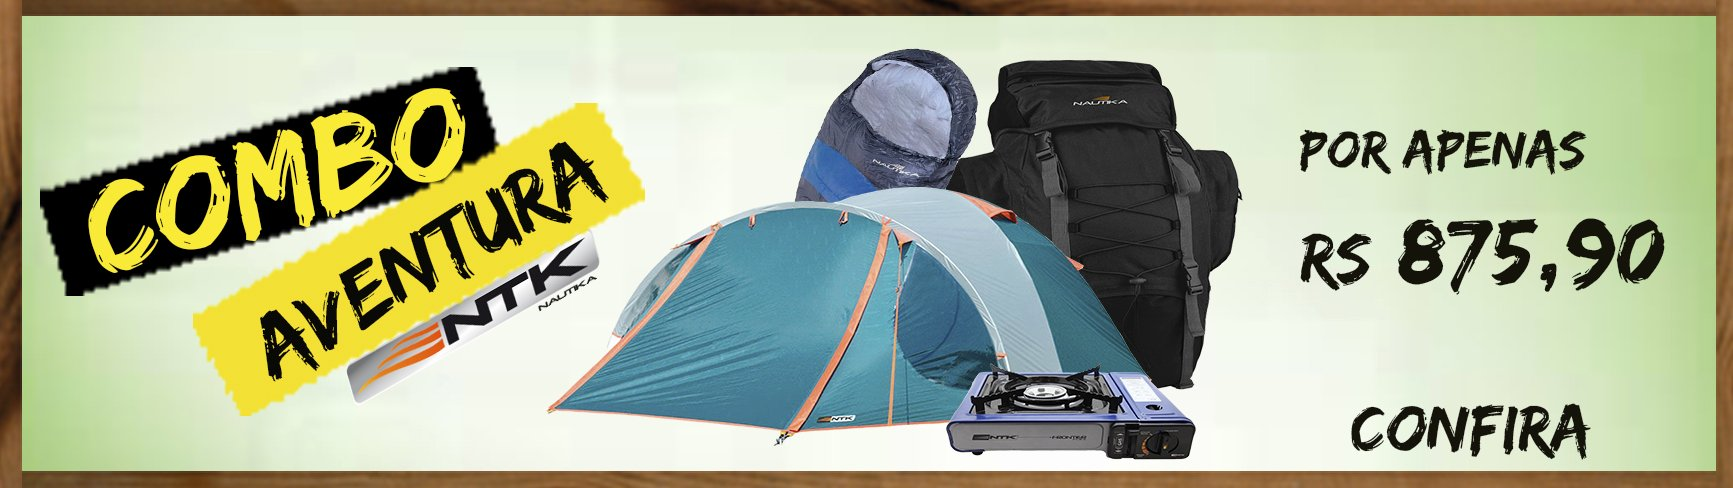 Combo Kit Camping NTK